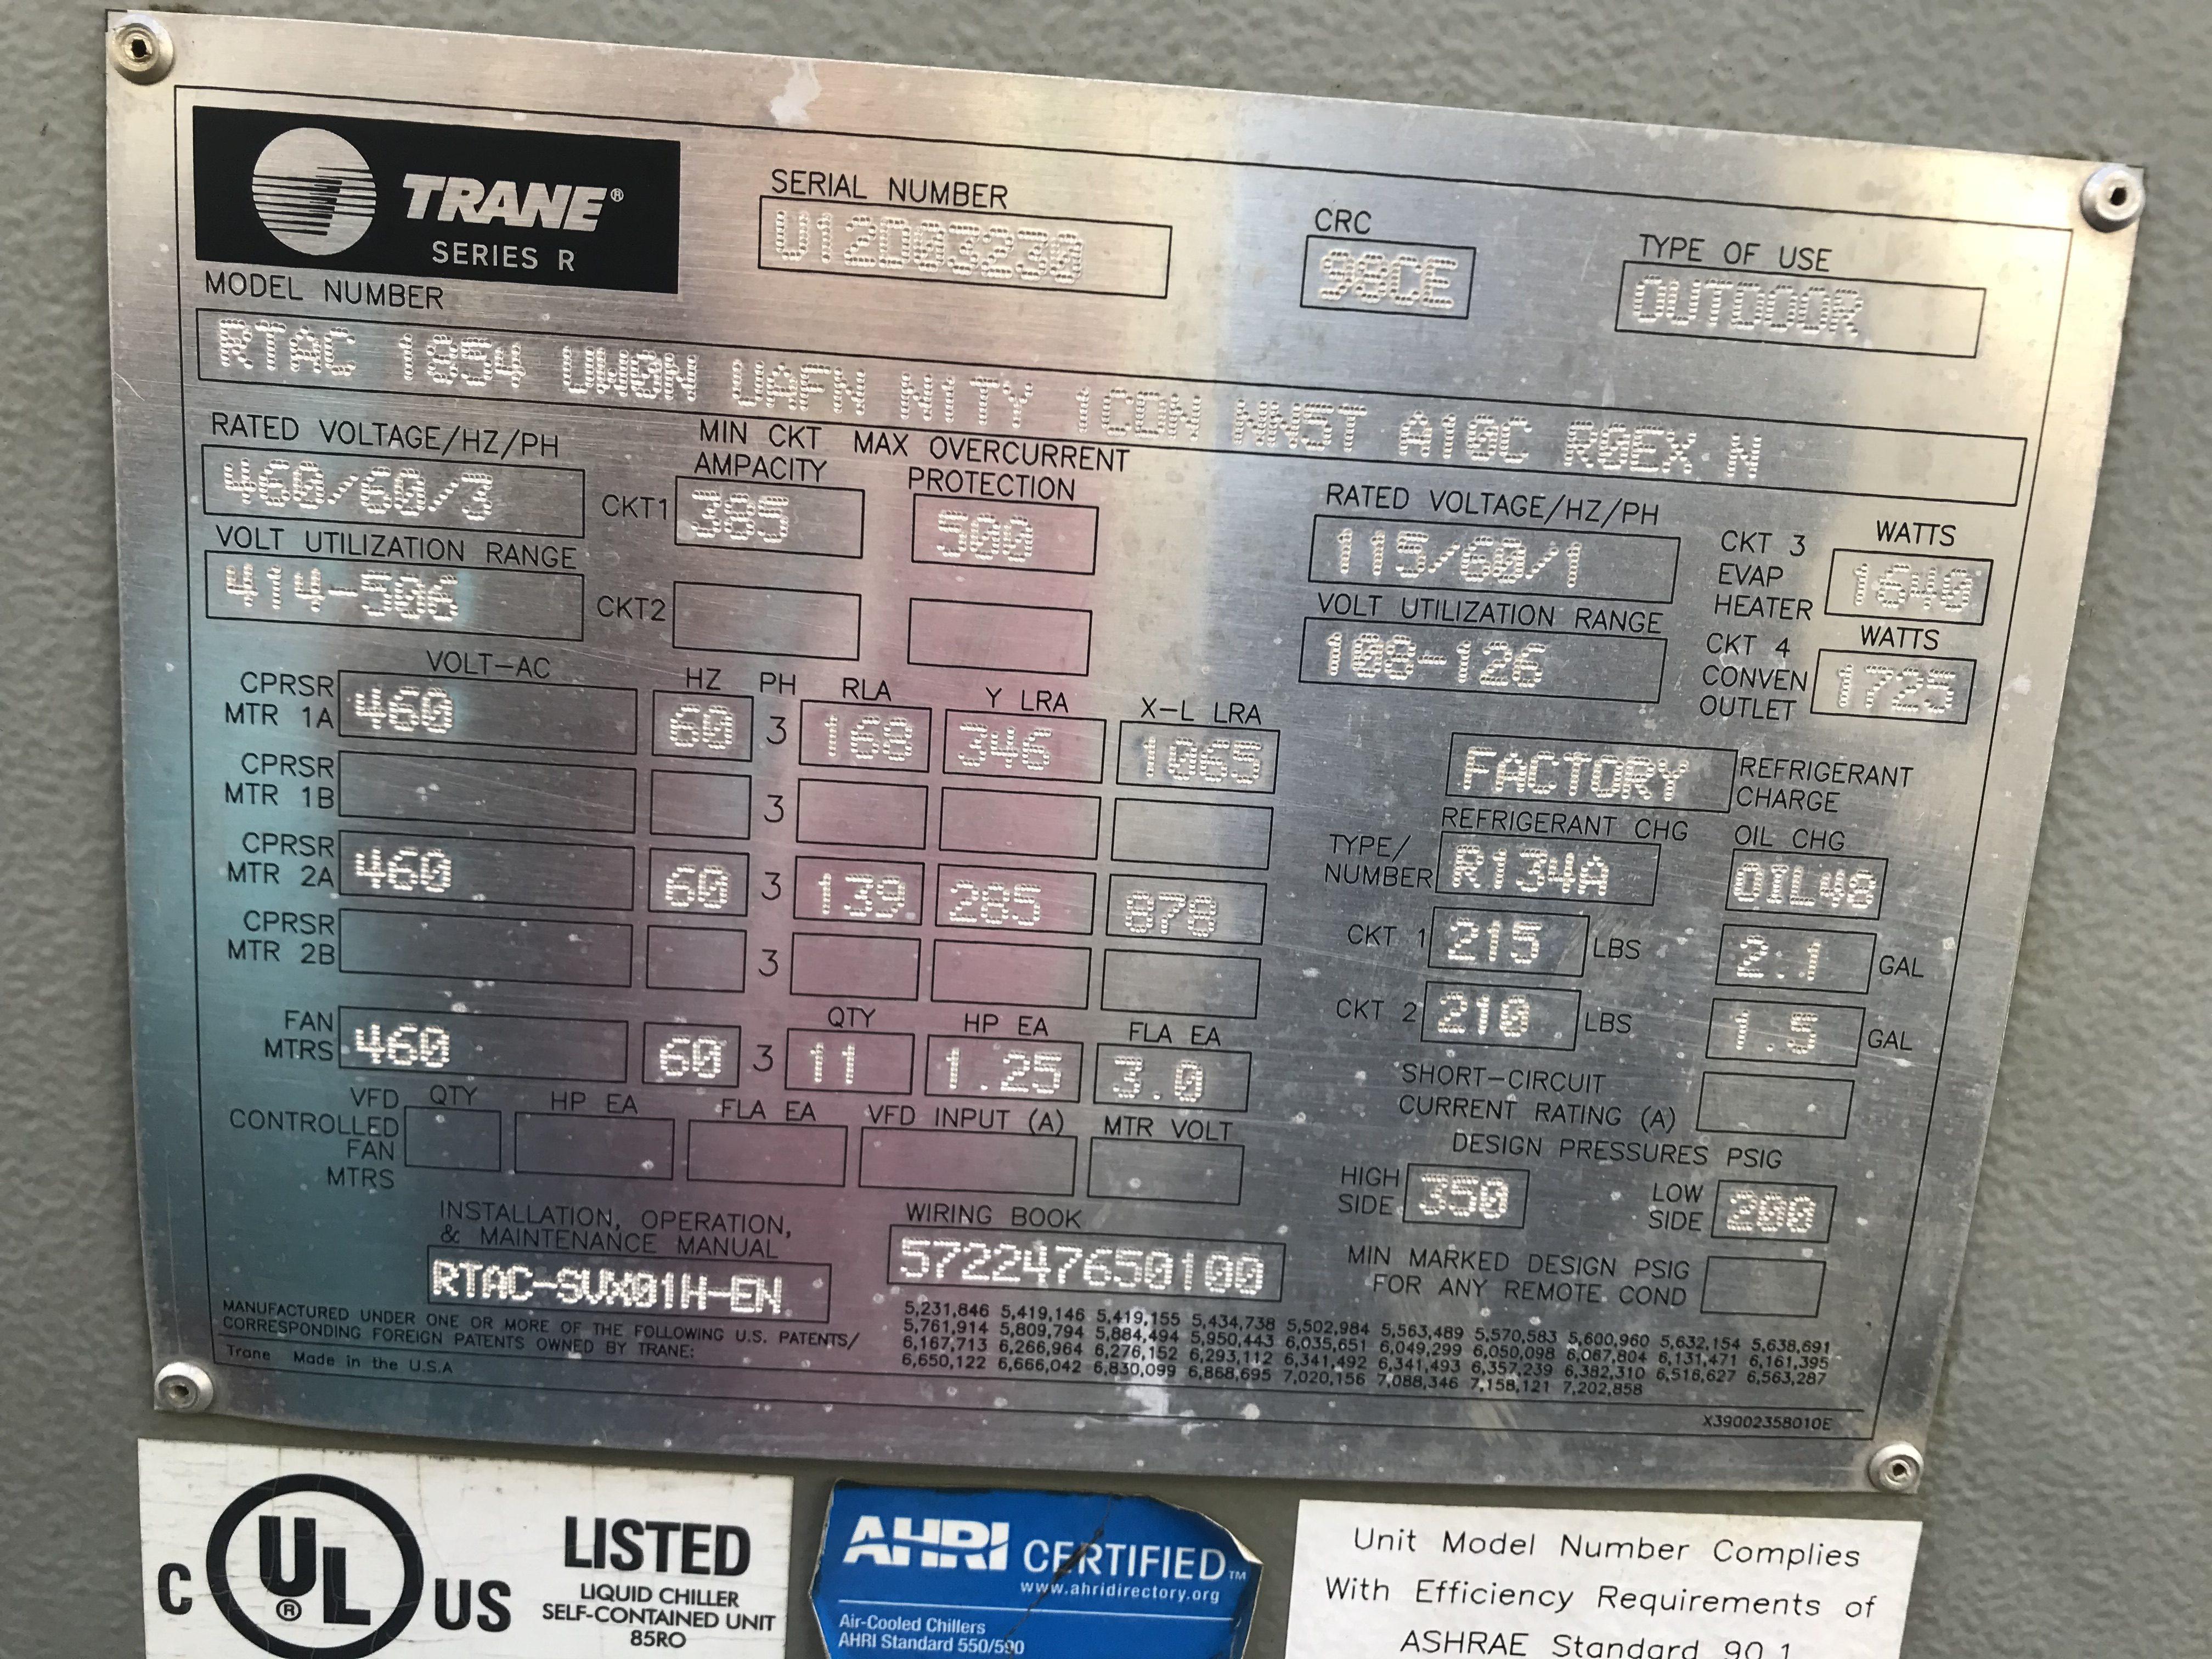 trane compressor serial number lookup